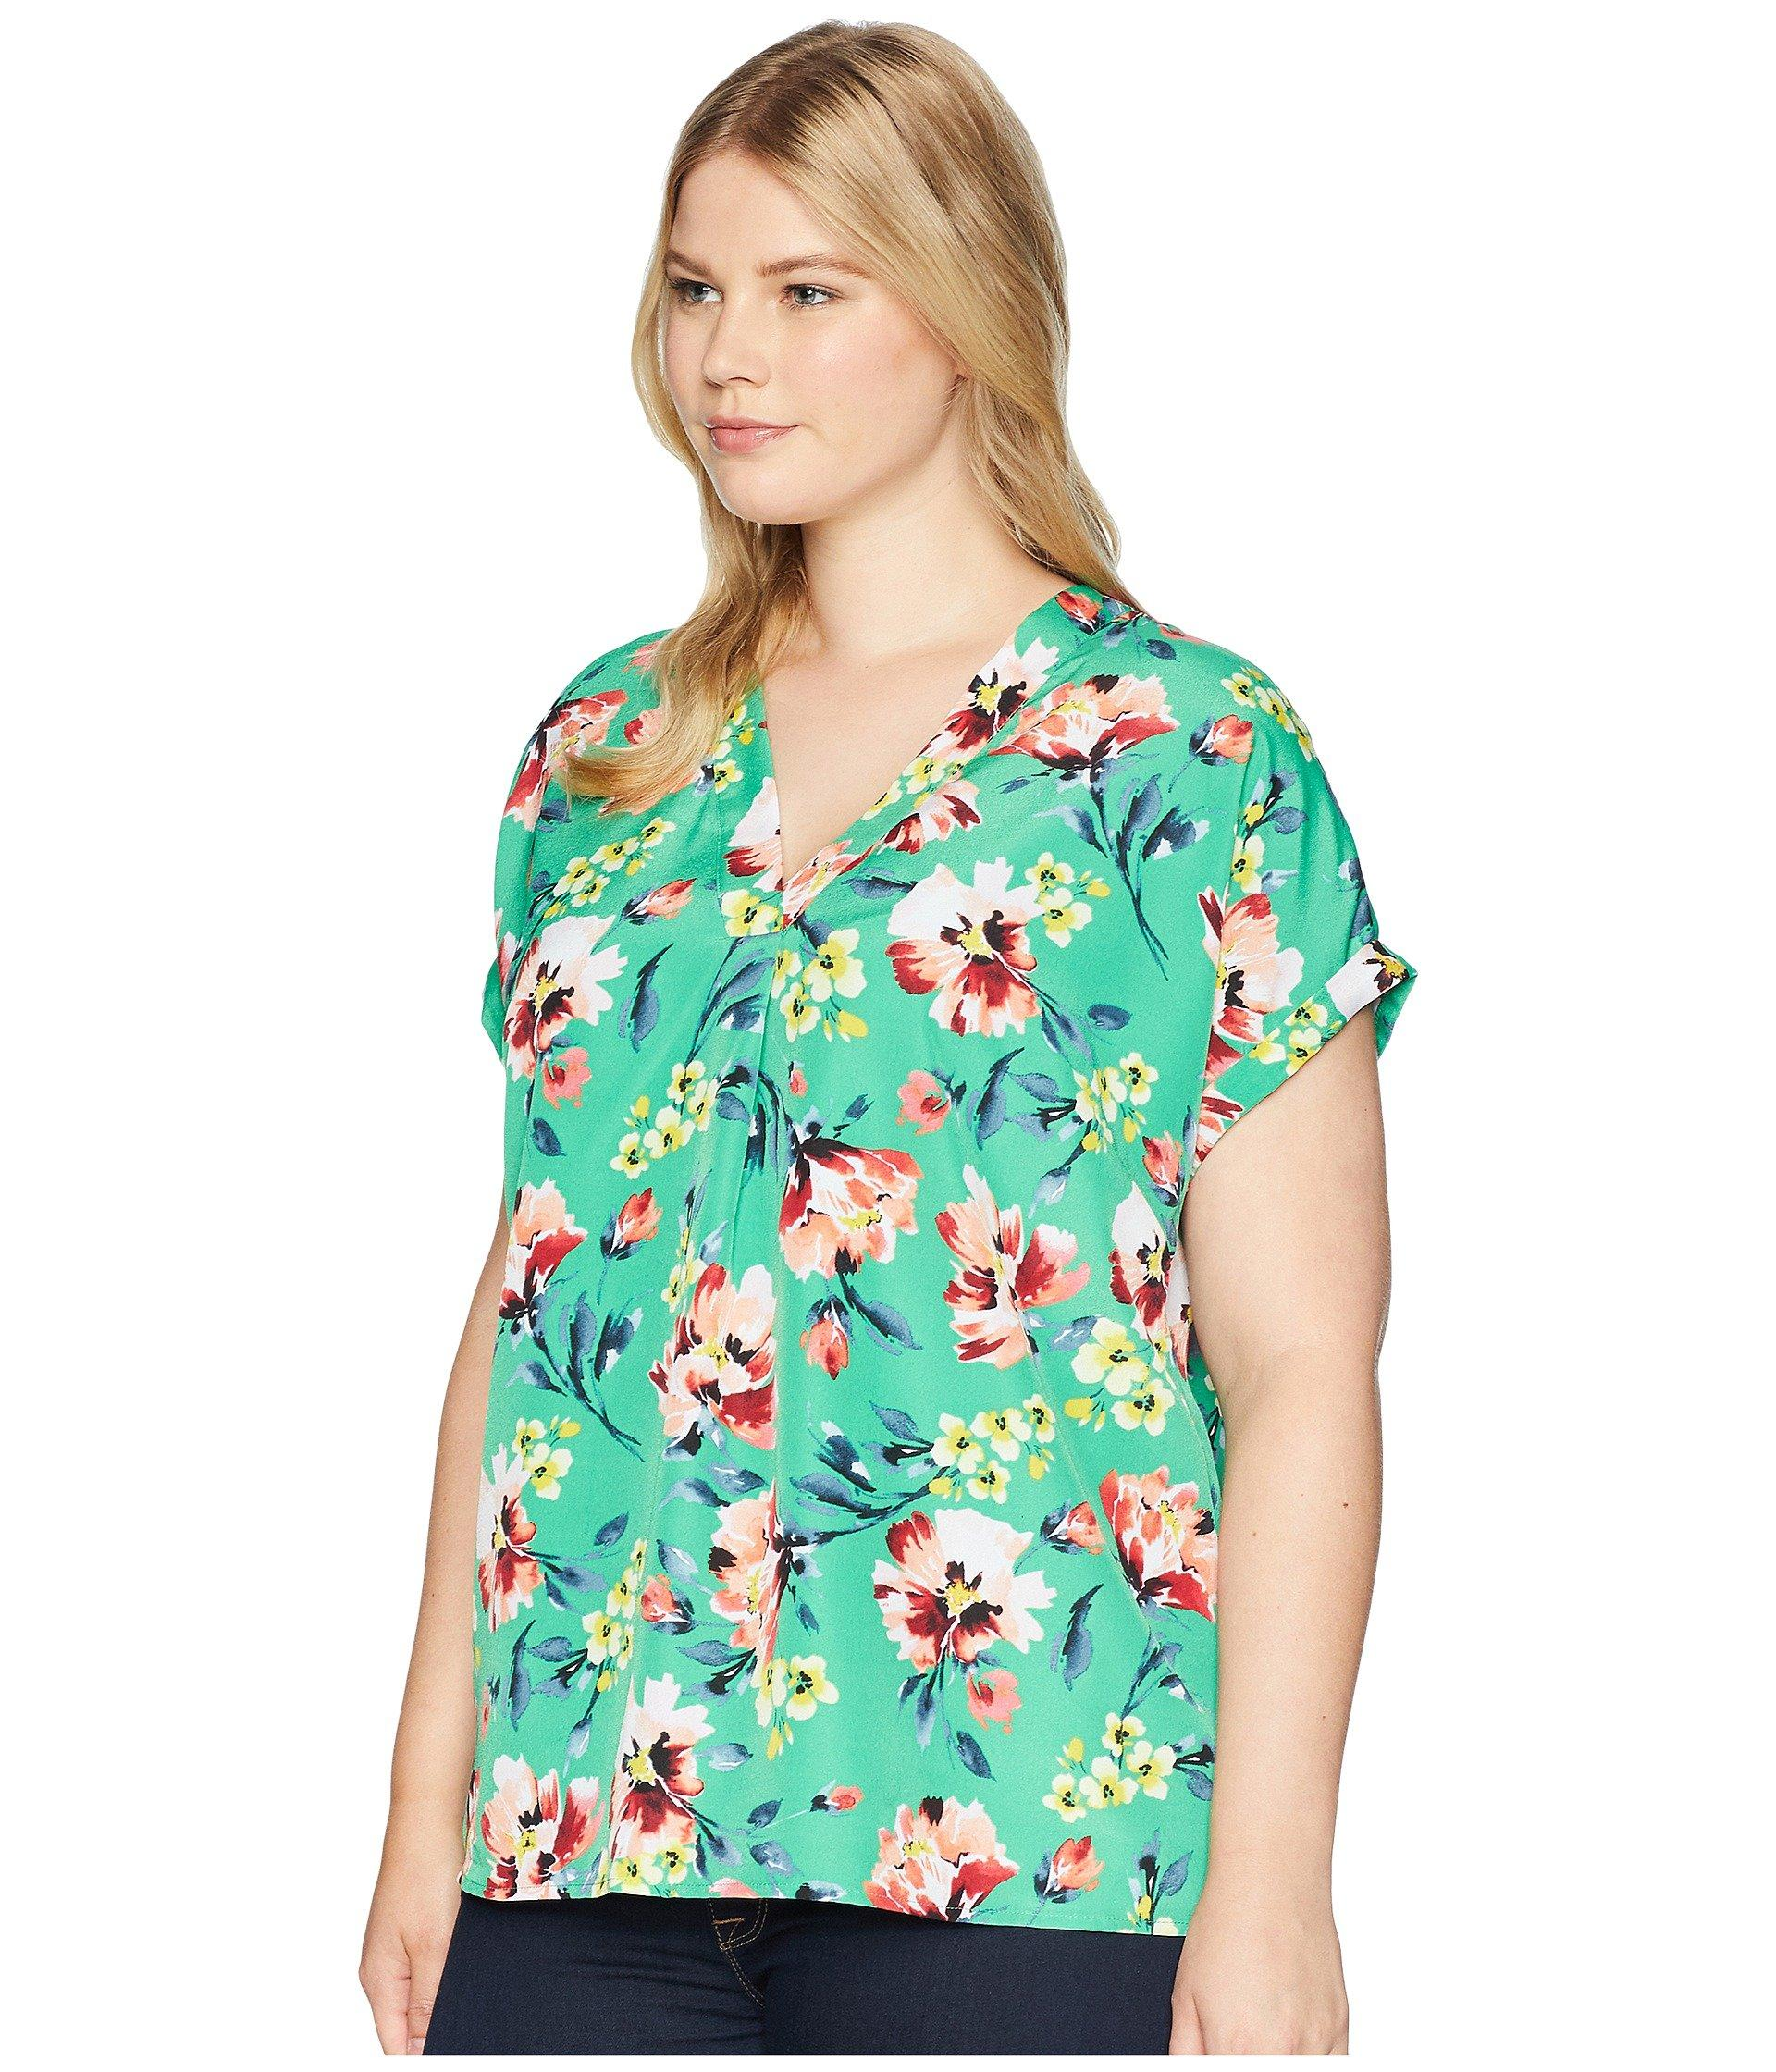 c6a1843489 Lauren by Ralph Lauren Plus Size Floral-print Crepe V-neck Top in ...